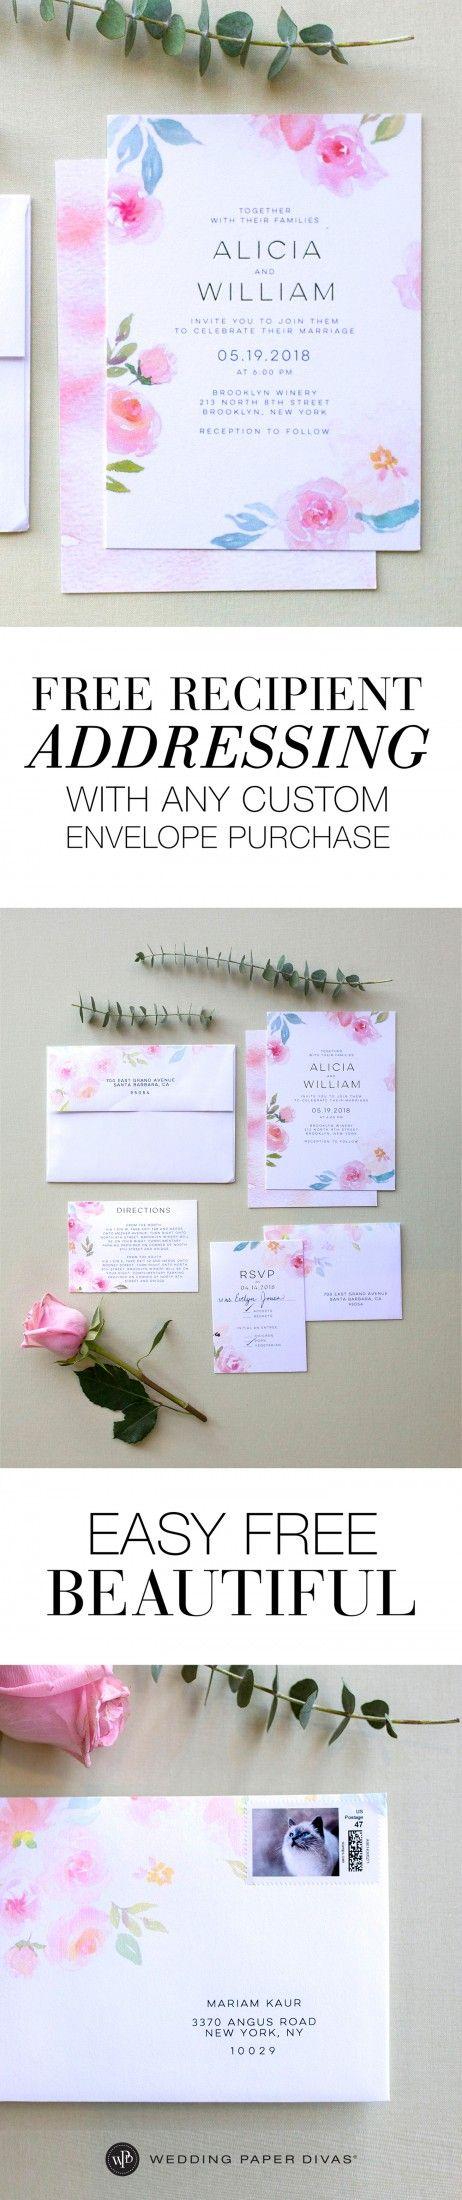 795 best Rustic Wedding Invitations images on Pinterest Rustic